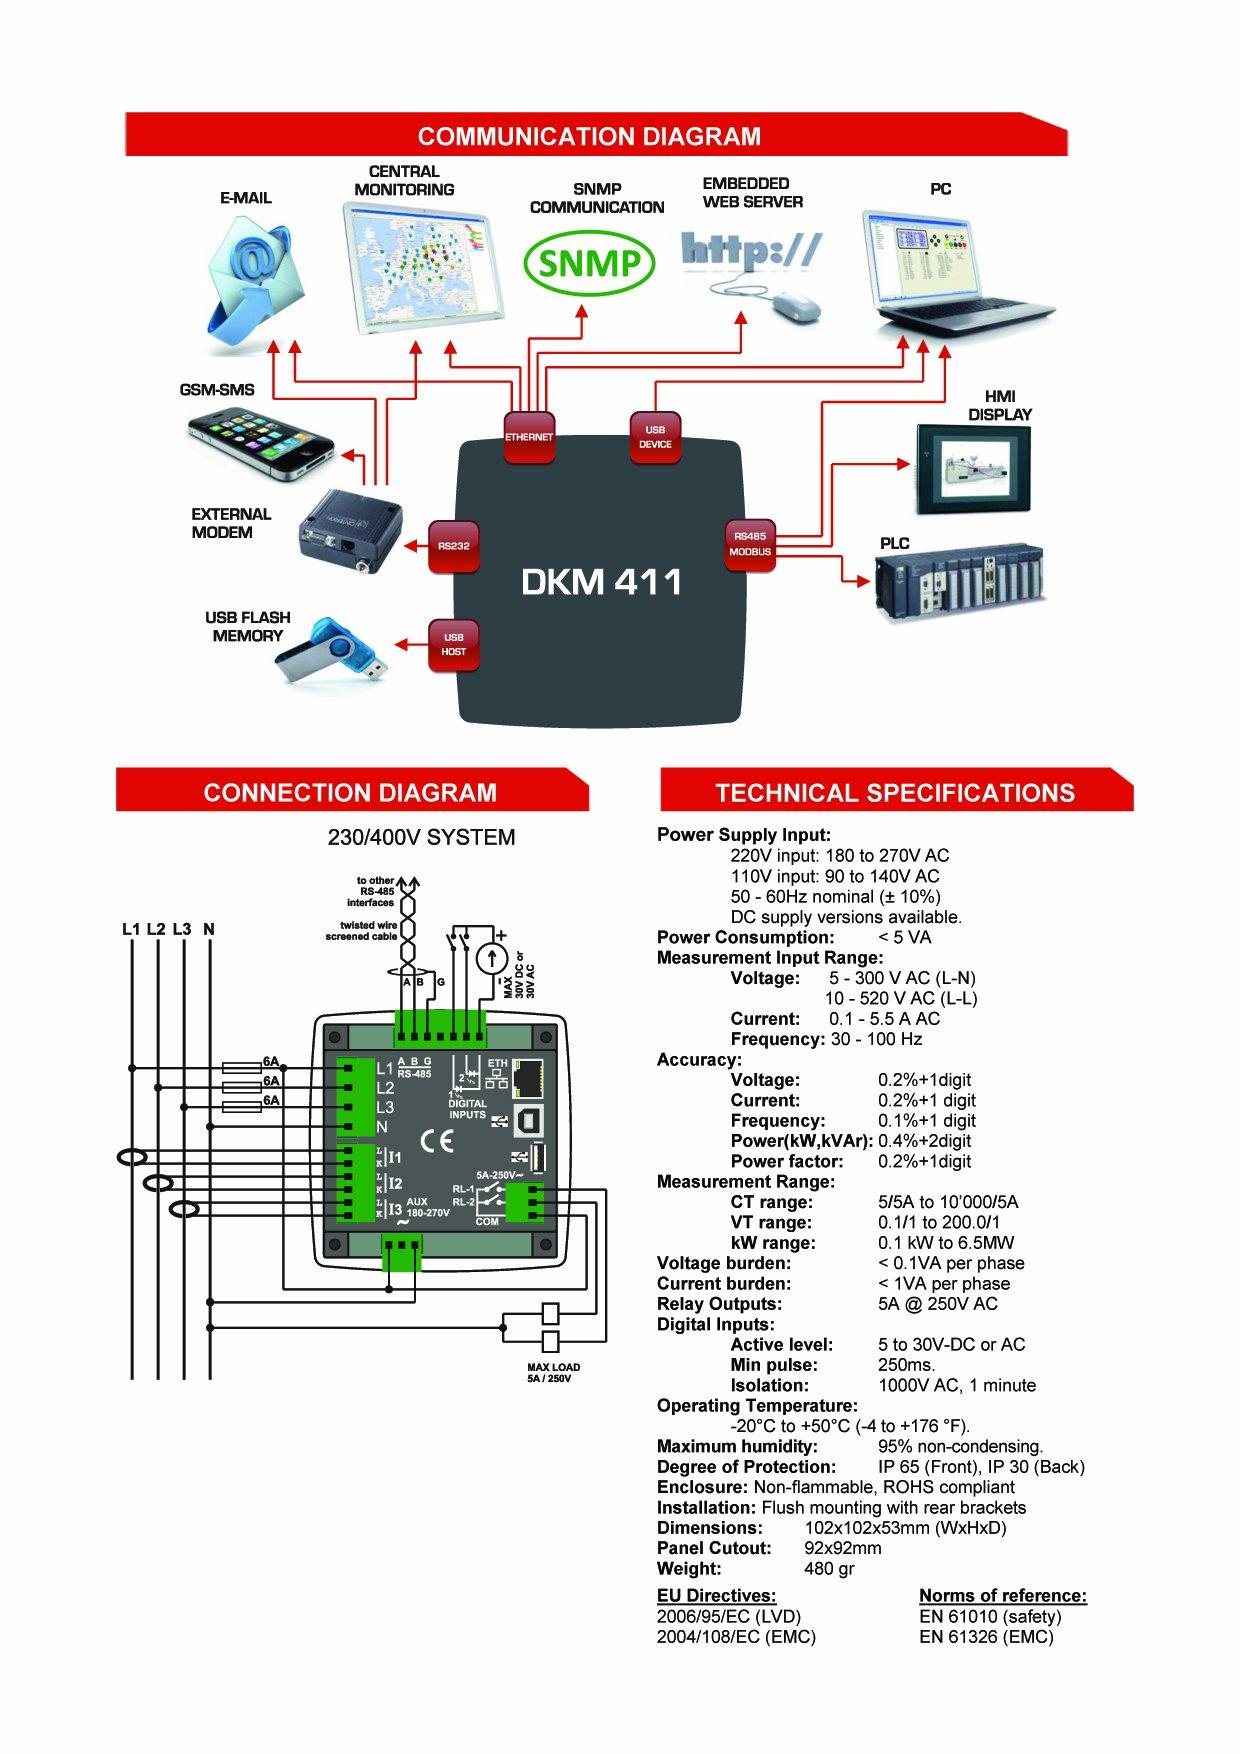 DATAKOM DKM-411 Network Analyser Multimeter Panel, Ethernet, USB-H, USB-D, RS485, RS232, I/O